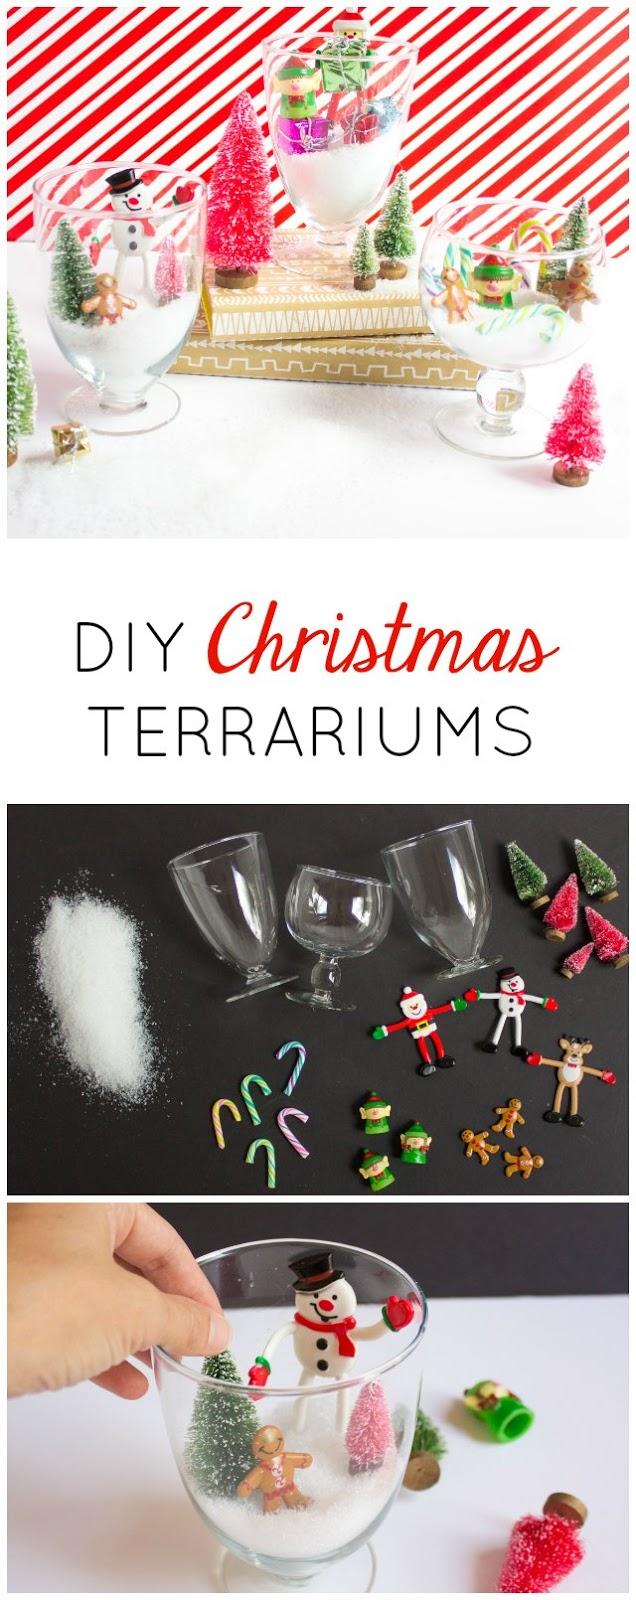 Such a fun Christmas centerpiece decoration - DIY mini Christmas terrariums!